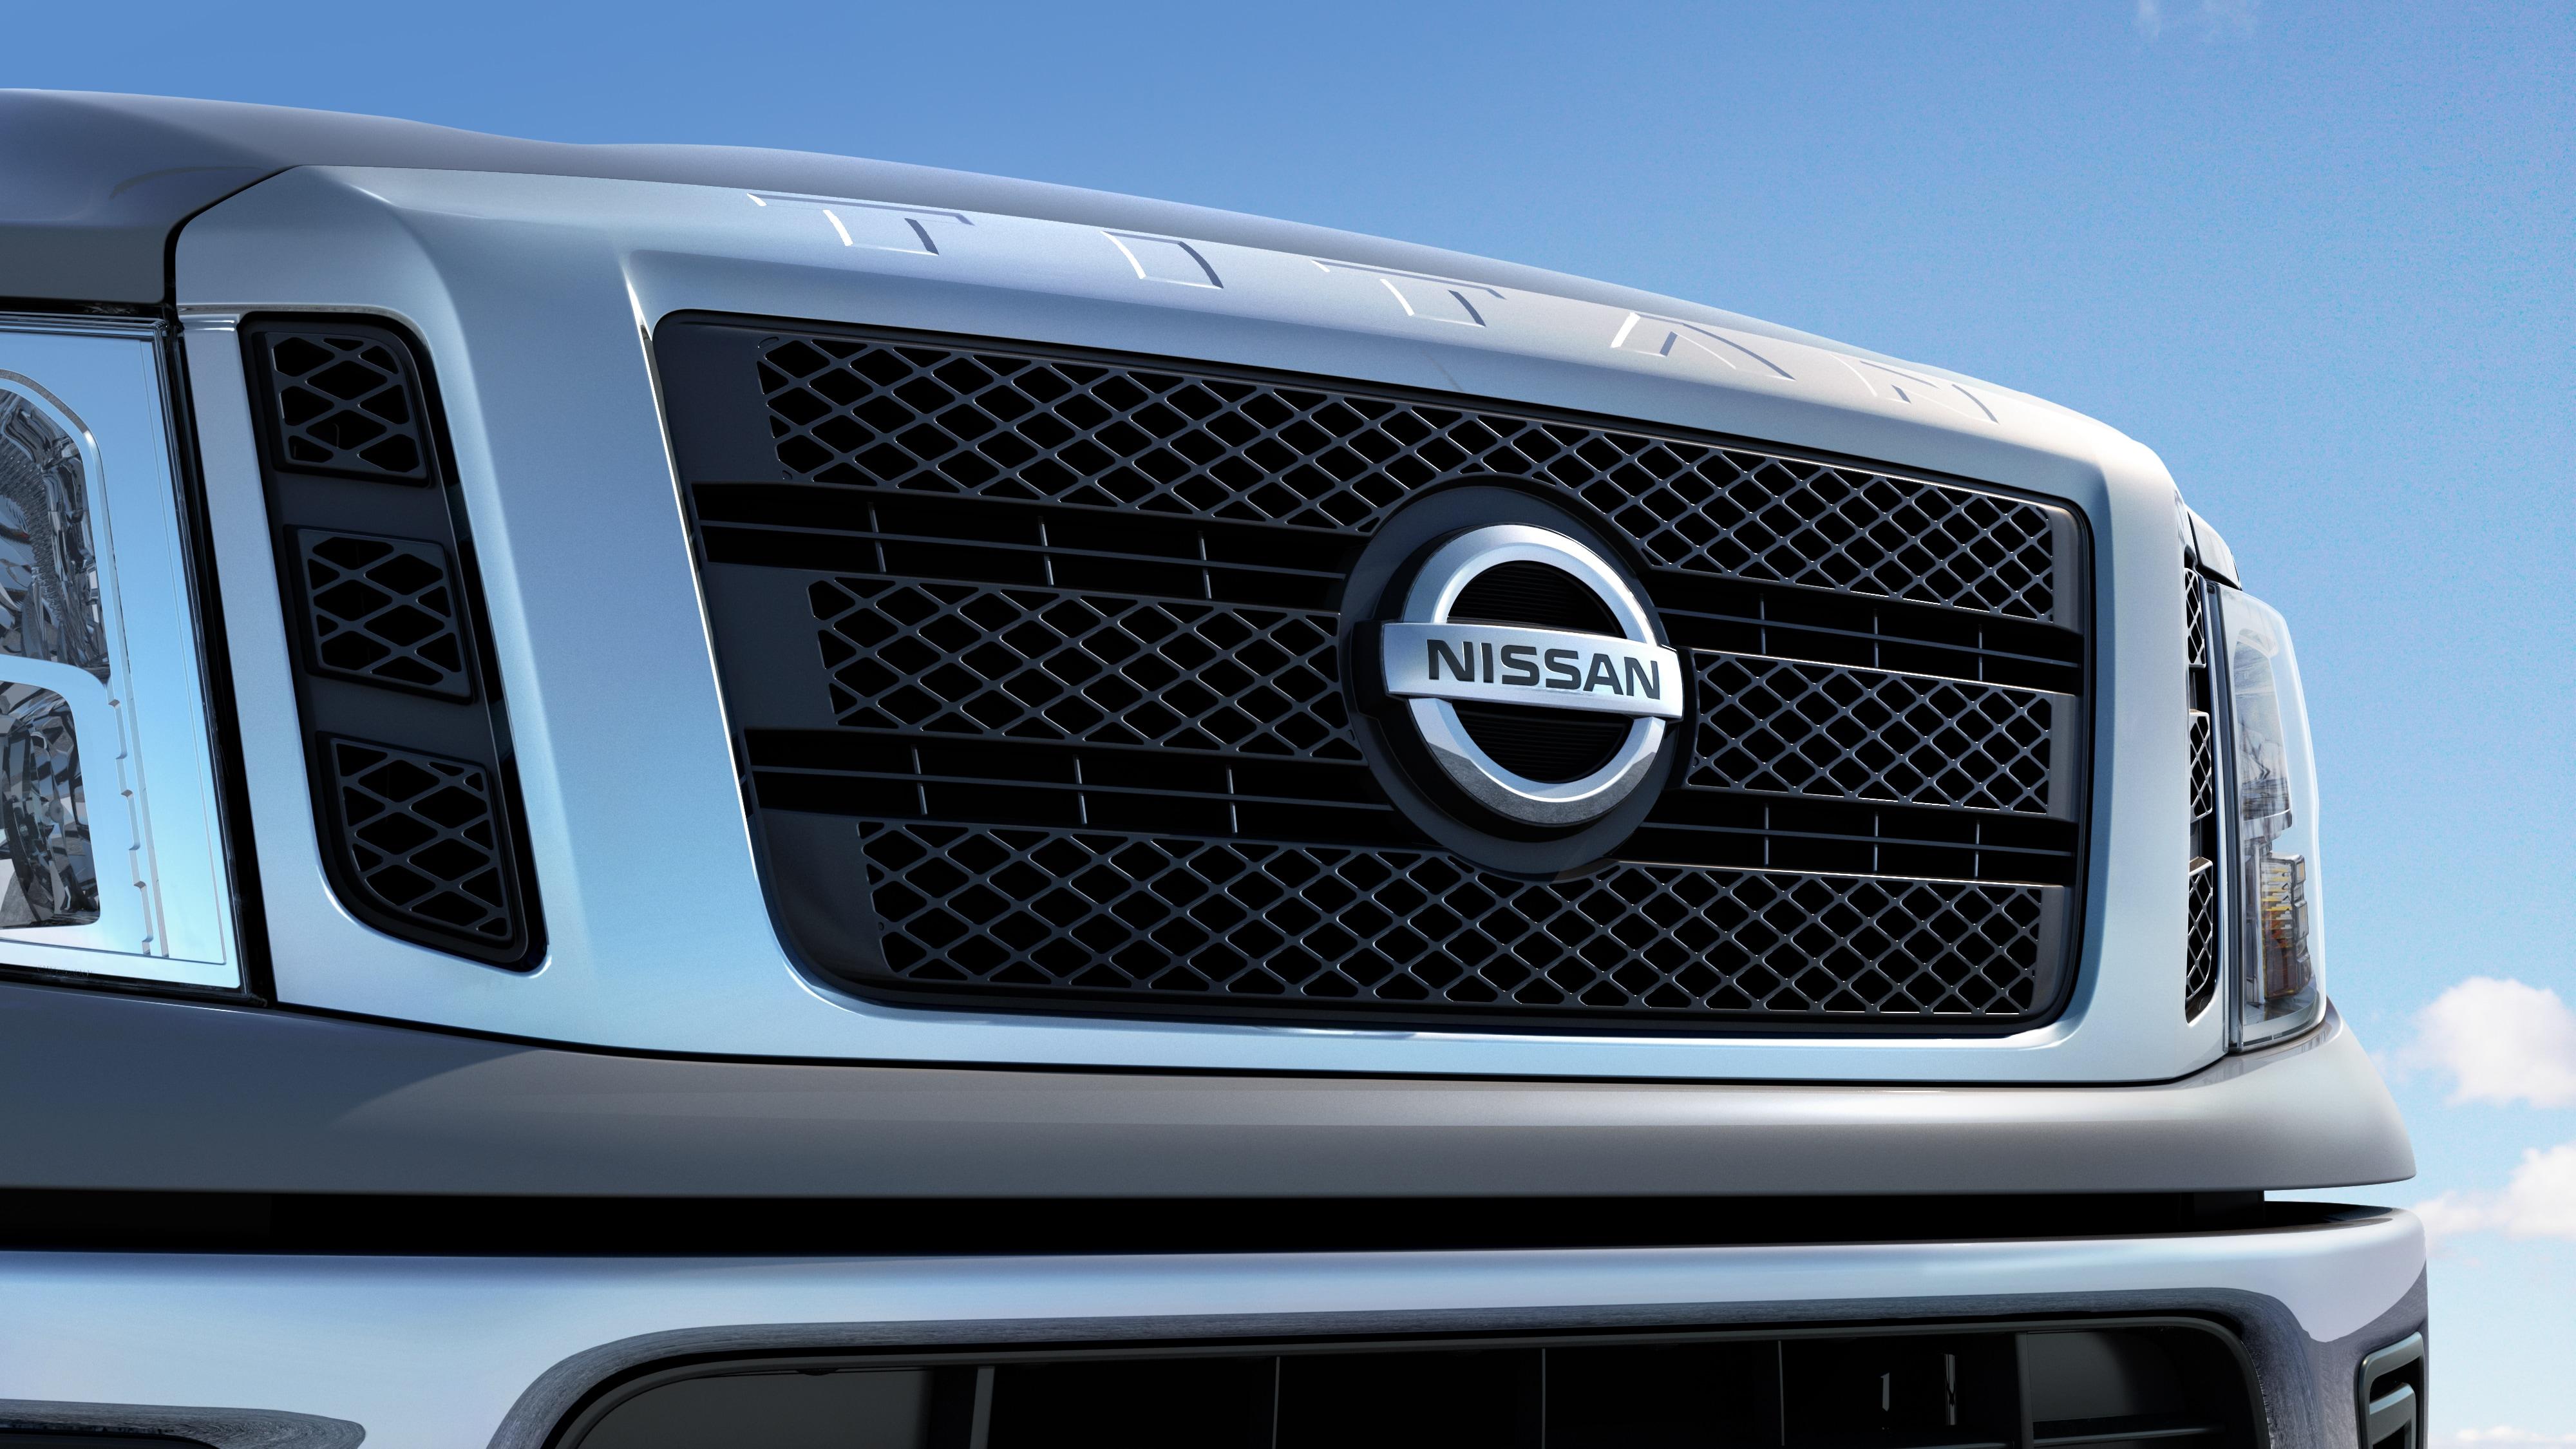 Jenkins Nissan Leesburg Florida – 10234 us highway 441, leesburg, fl, 34788.